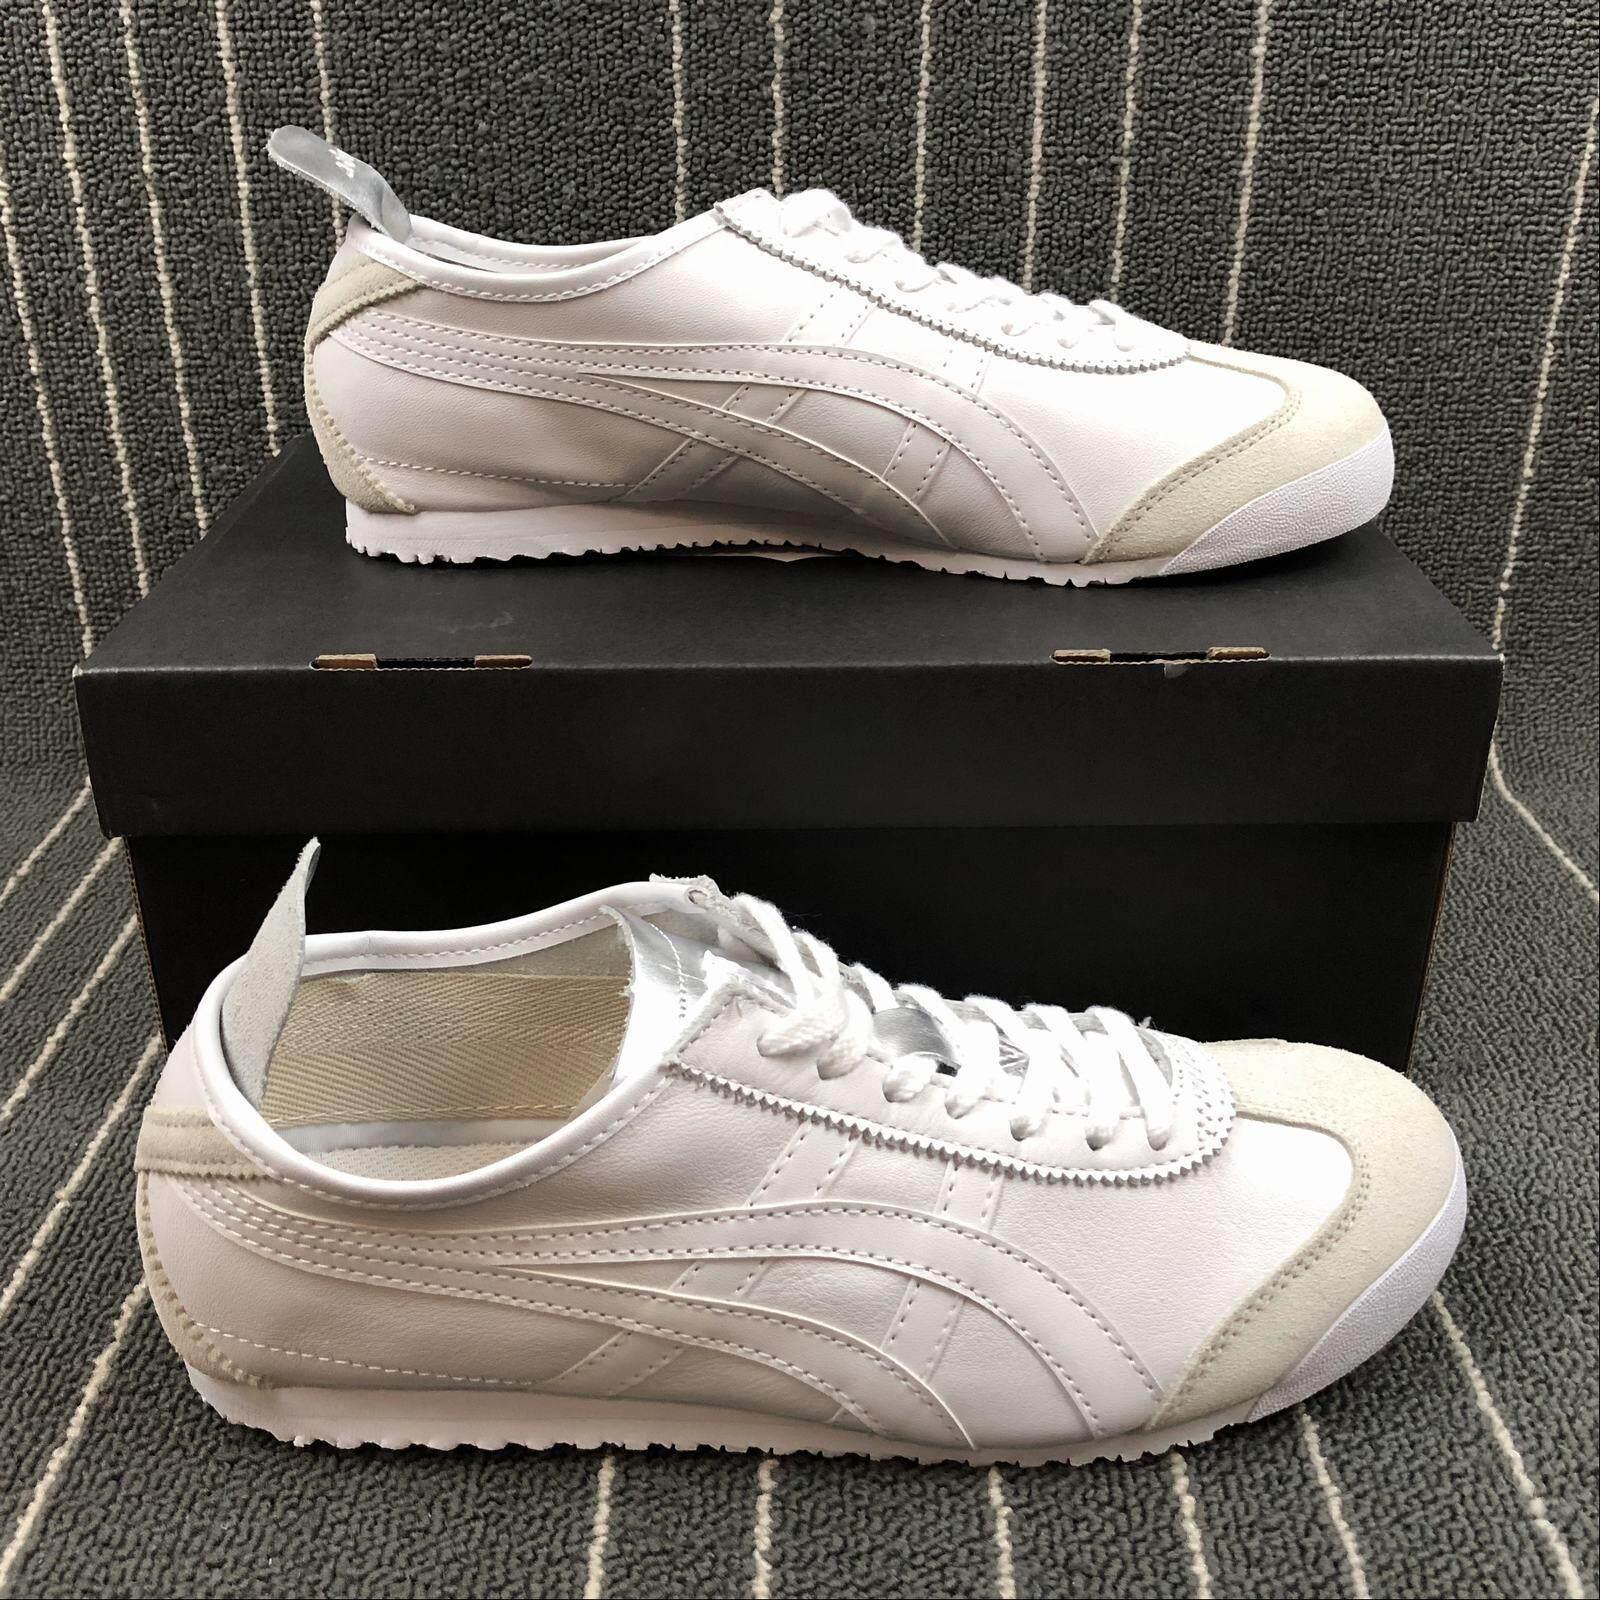 d0bafde5b64d8 Asics Onitsuka tiger MEXICO 66 D7C3L-0101 Men s Women s Sport Fashion  Running Shoes Sneakers